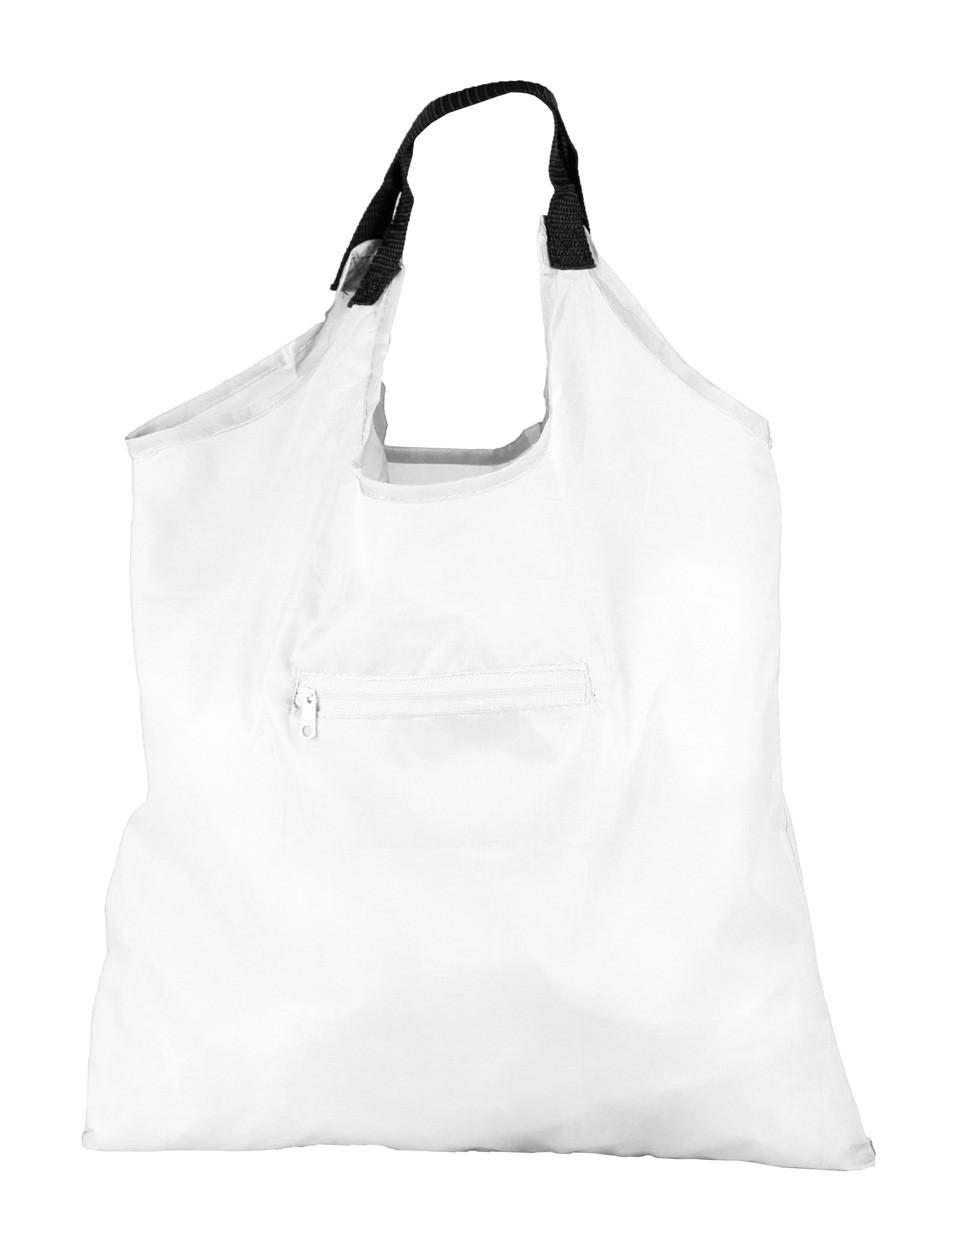 Foldable Shopping Bag Kima - White